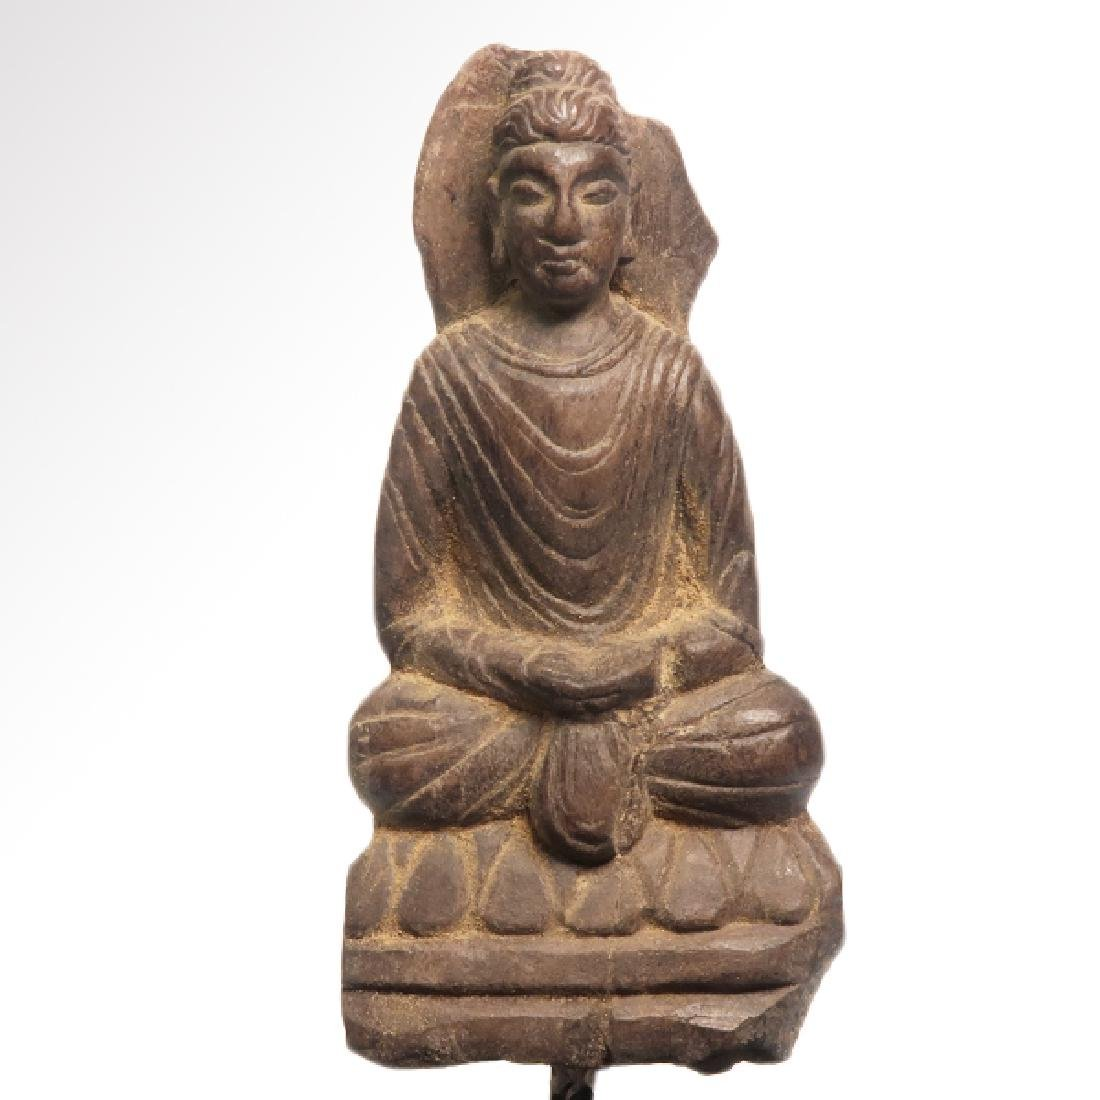 Gandhara Terracotta Figure of Buddha, c. 3rd-4th